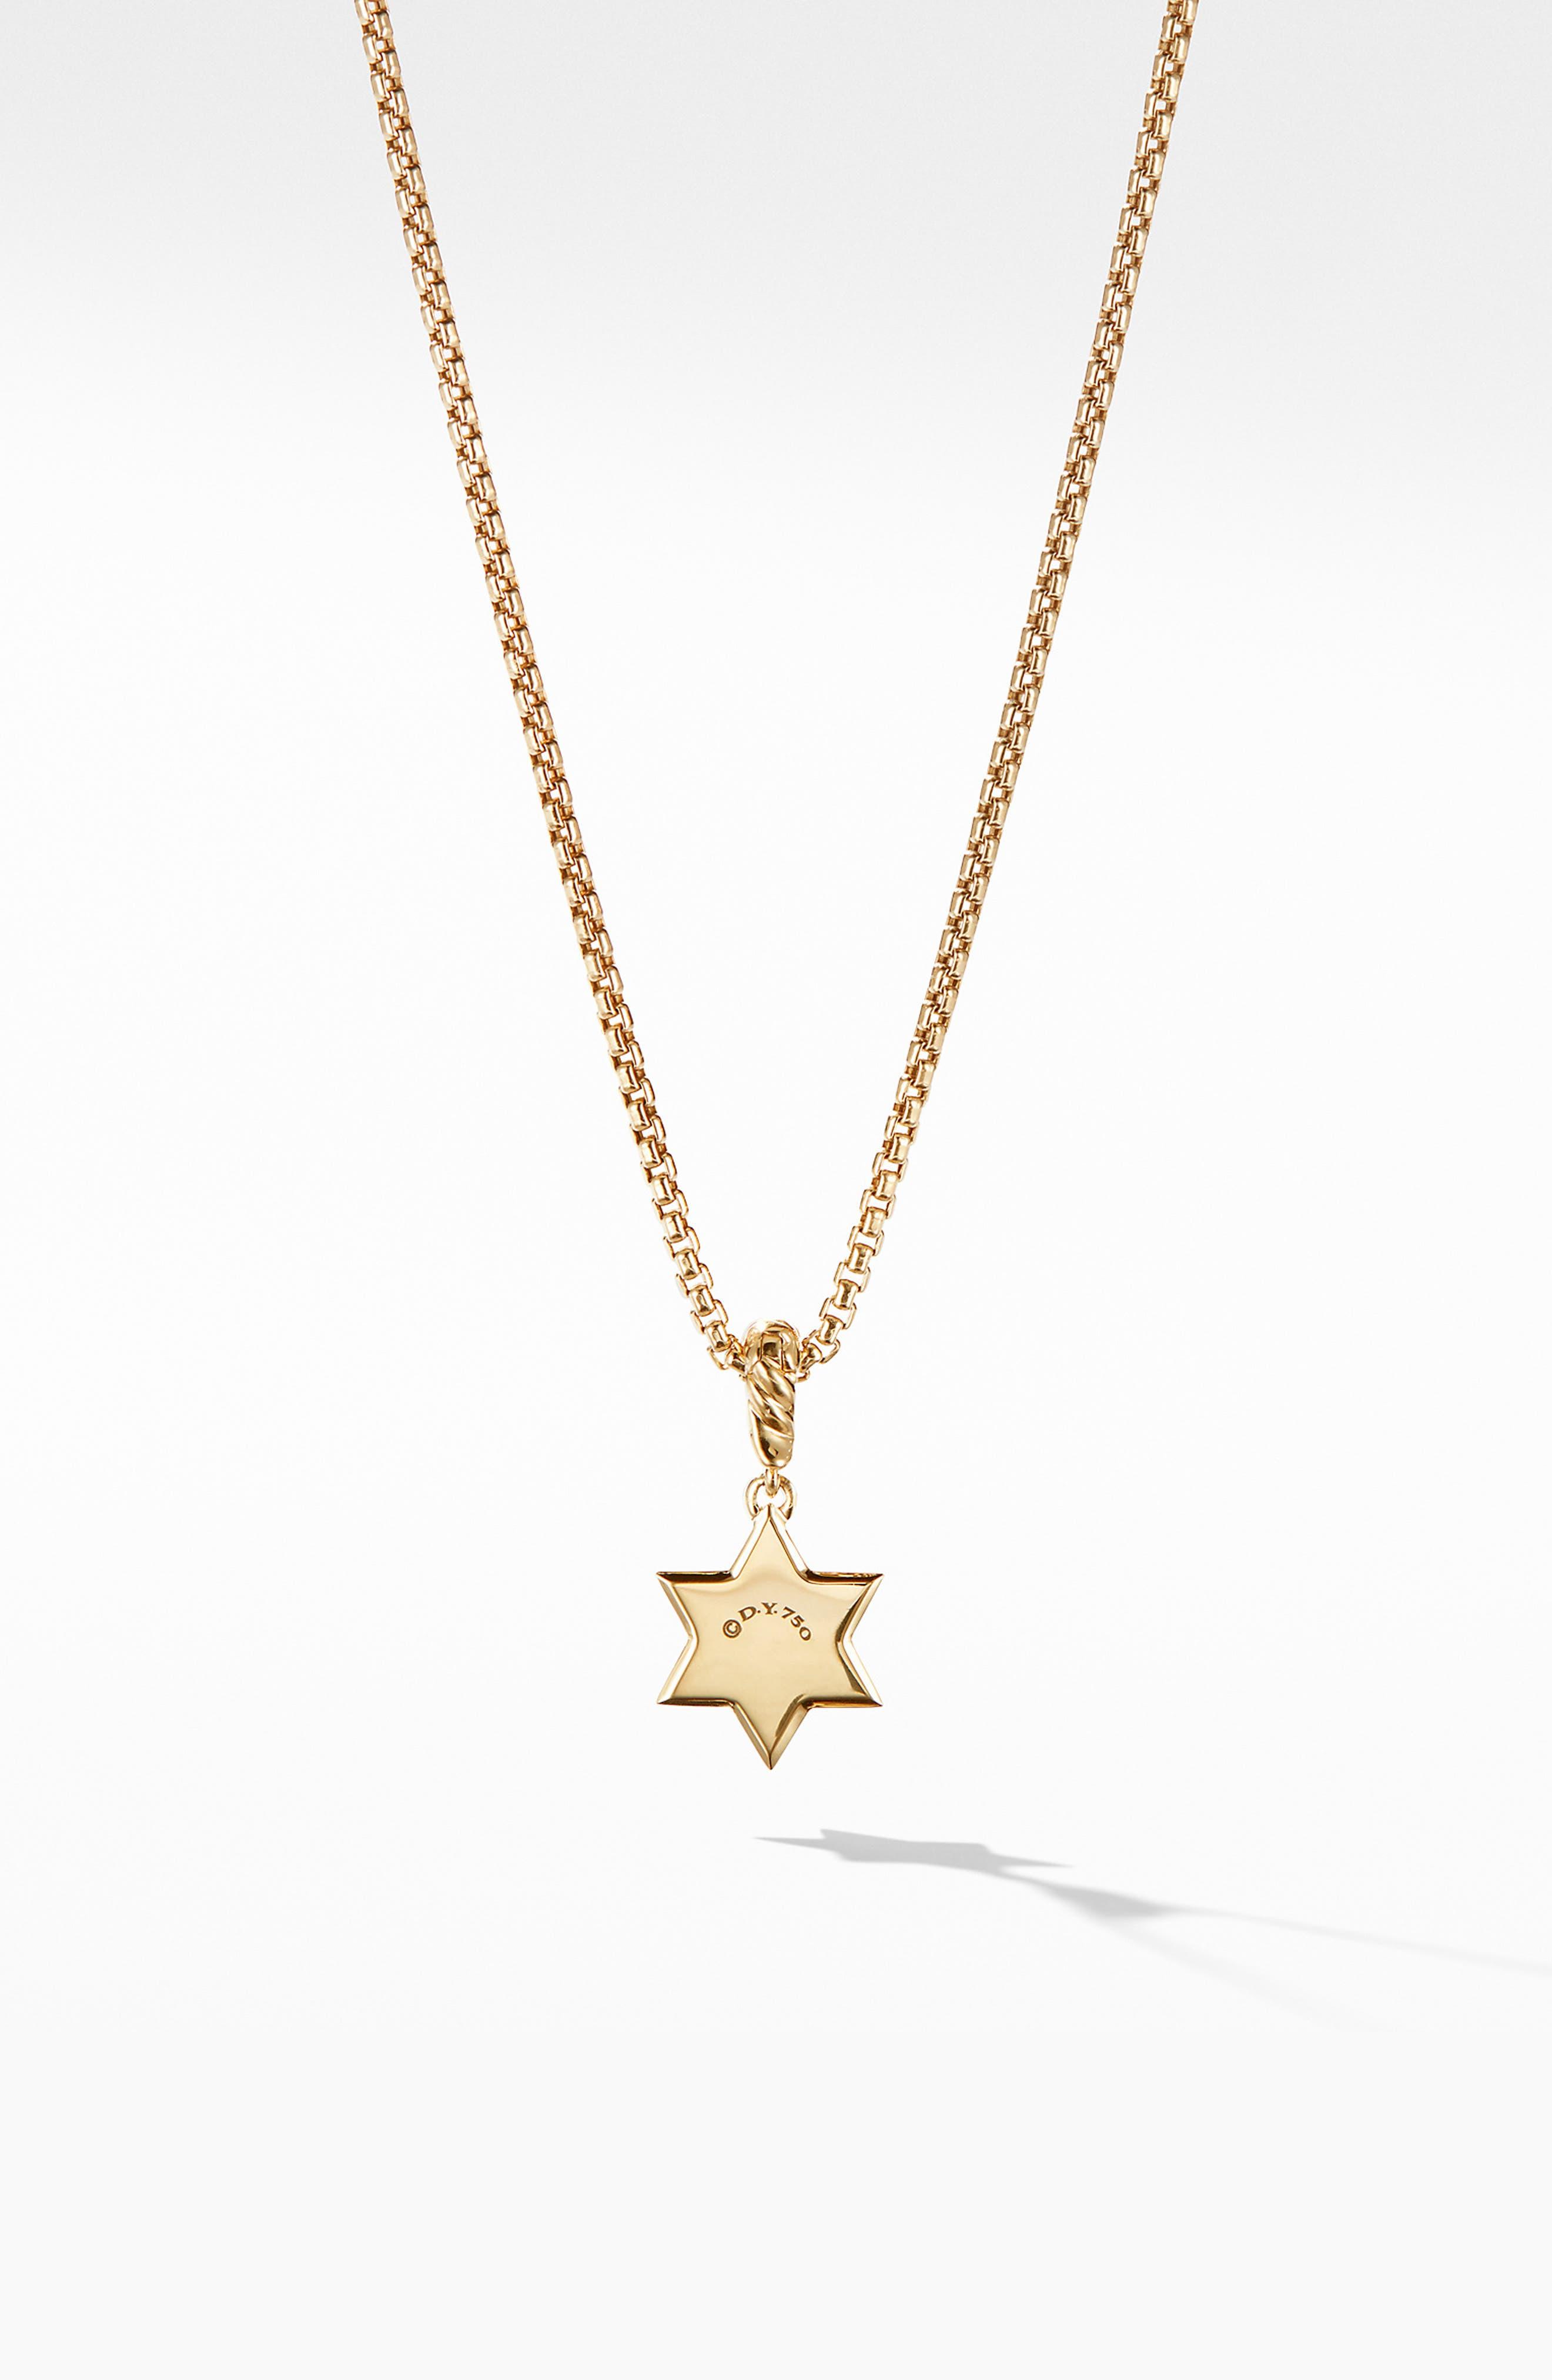 Star of David Pendant in 18K Yellow Gold with Diamonds,                             Alternate thumbnail 2, color,                             YELLOW GOLD/ DIAMOND